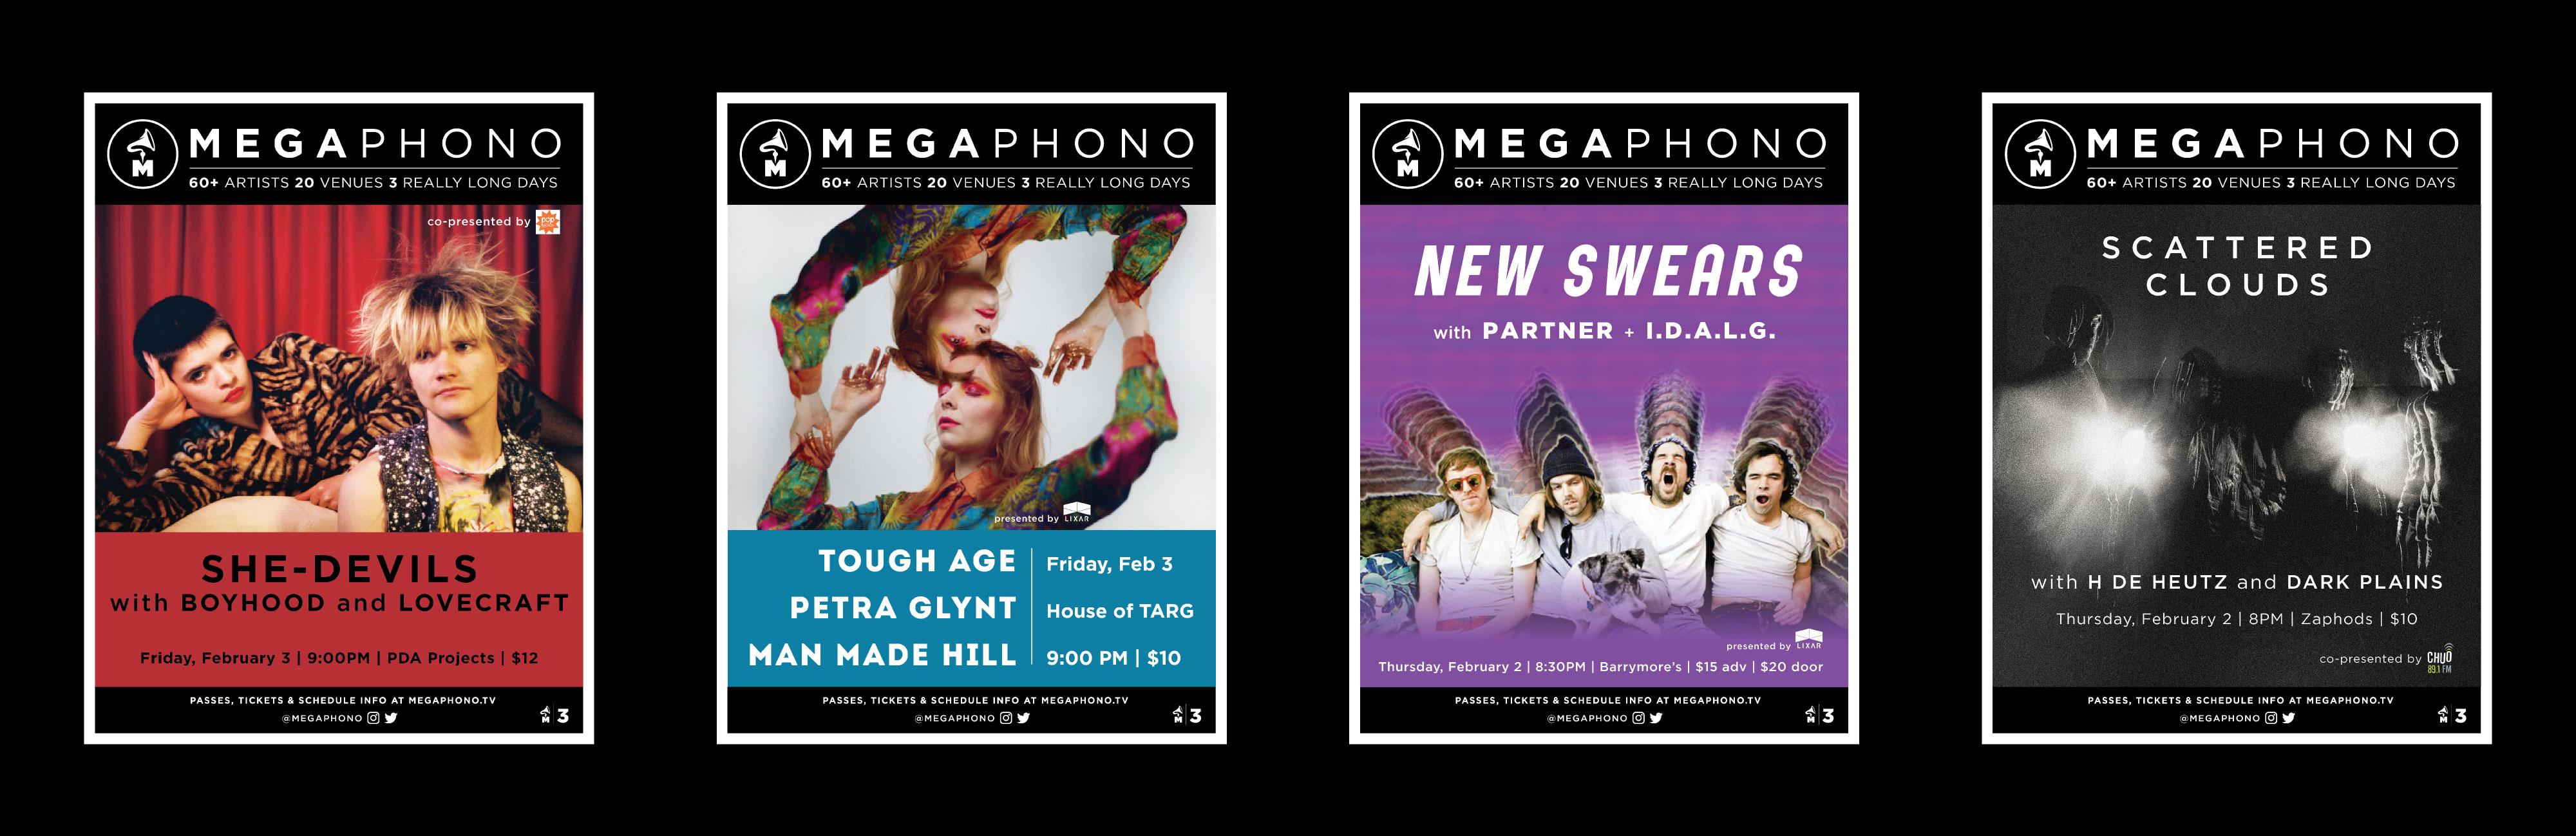 megaphono-posters-02